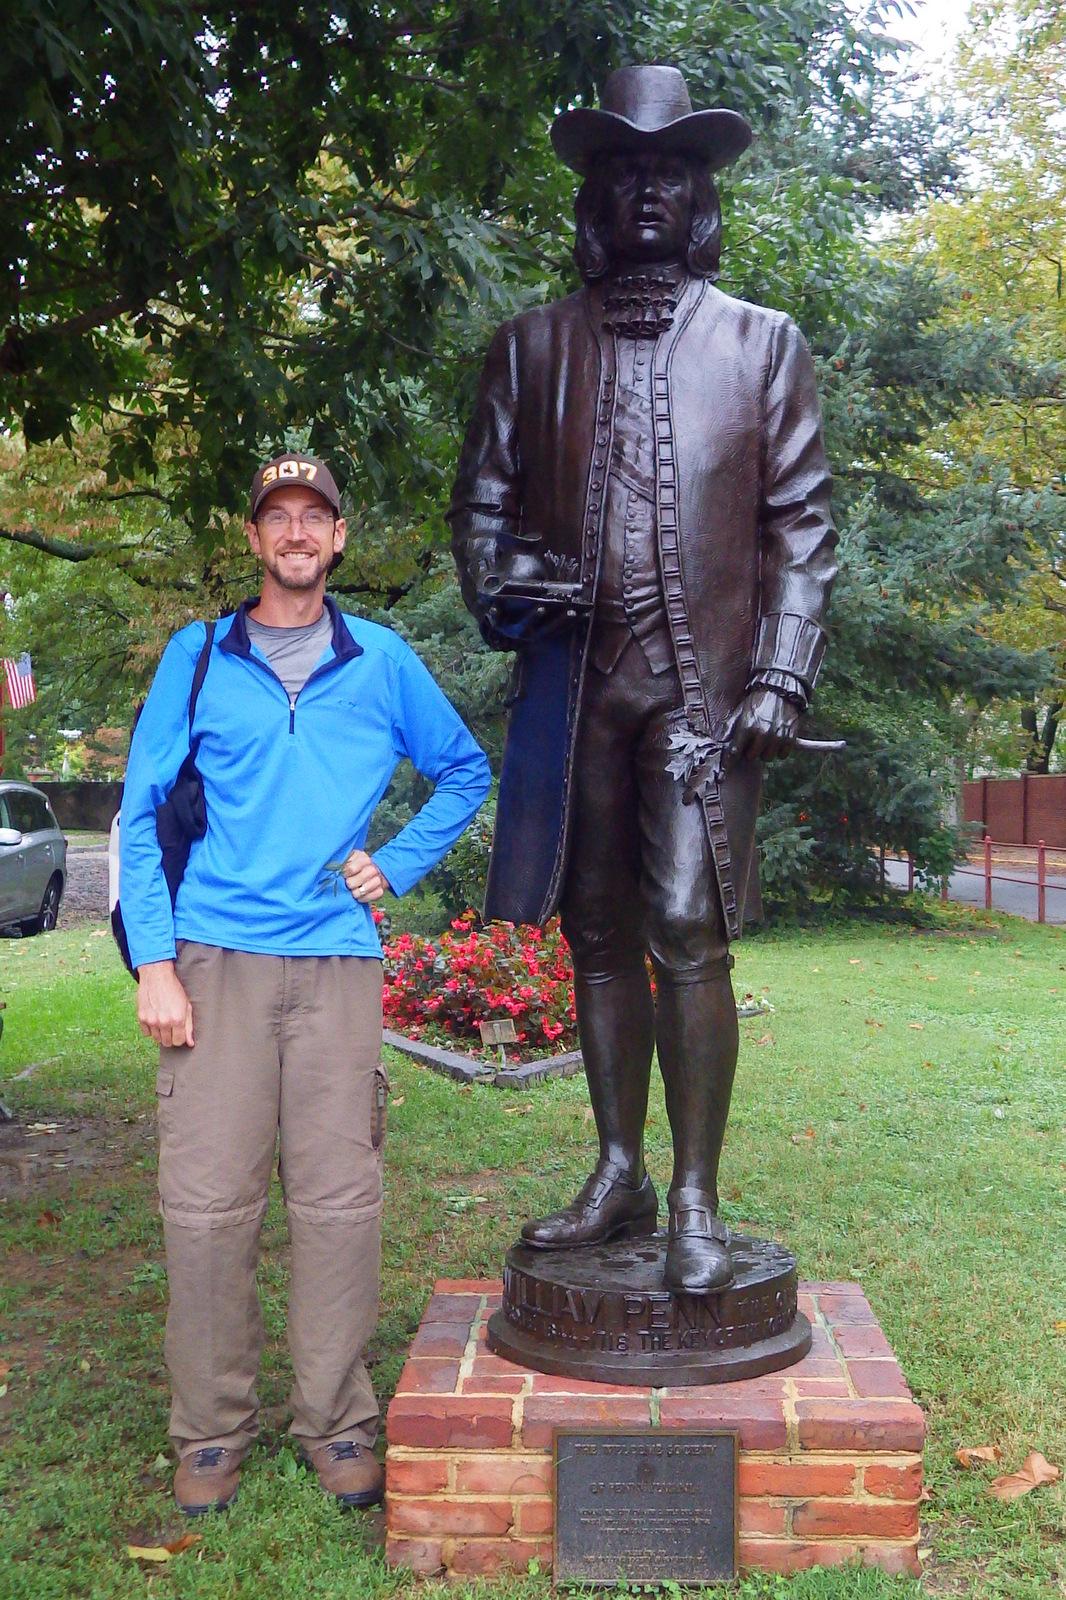 William Penn, founder of Delaware (formerly part of Pennsylvania)